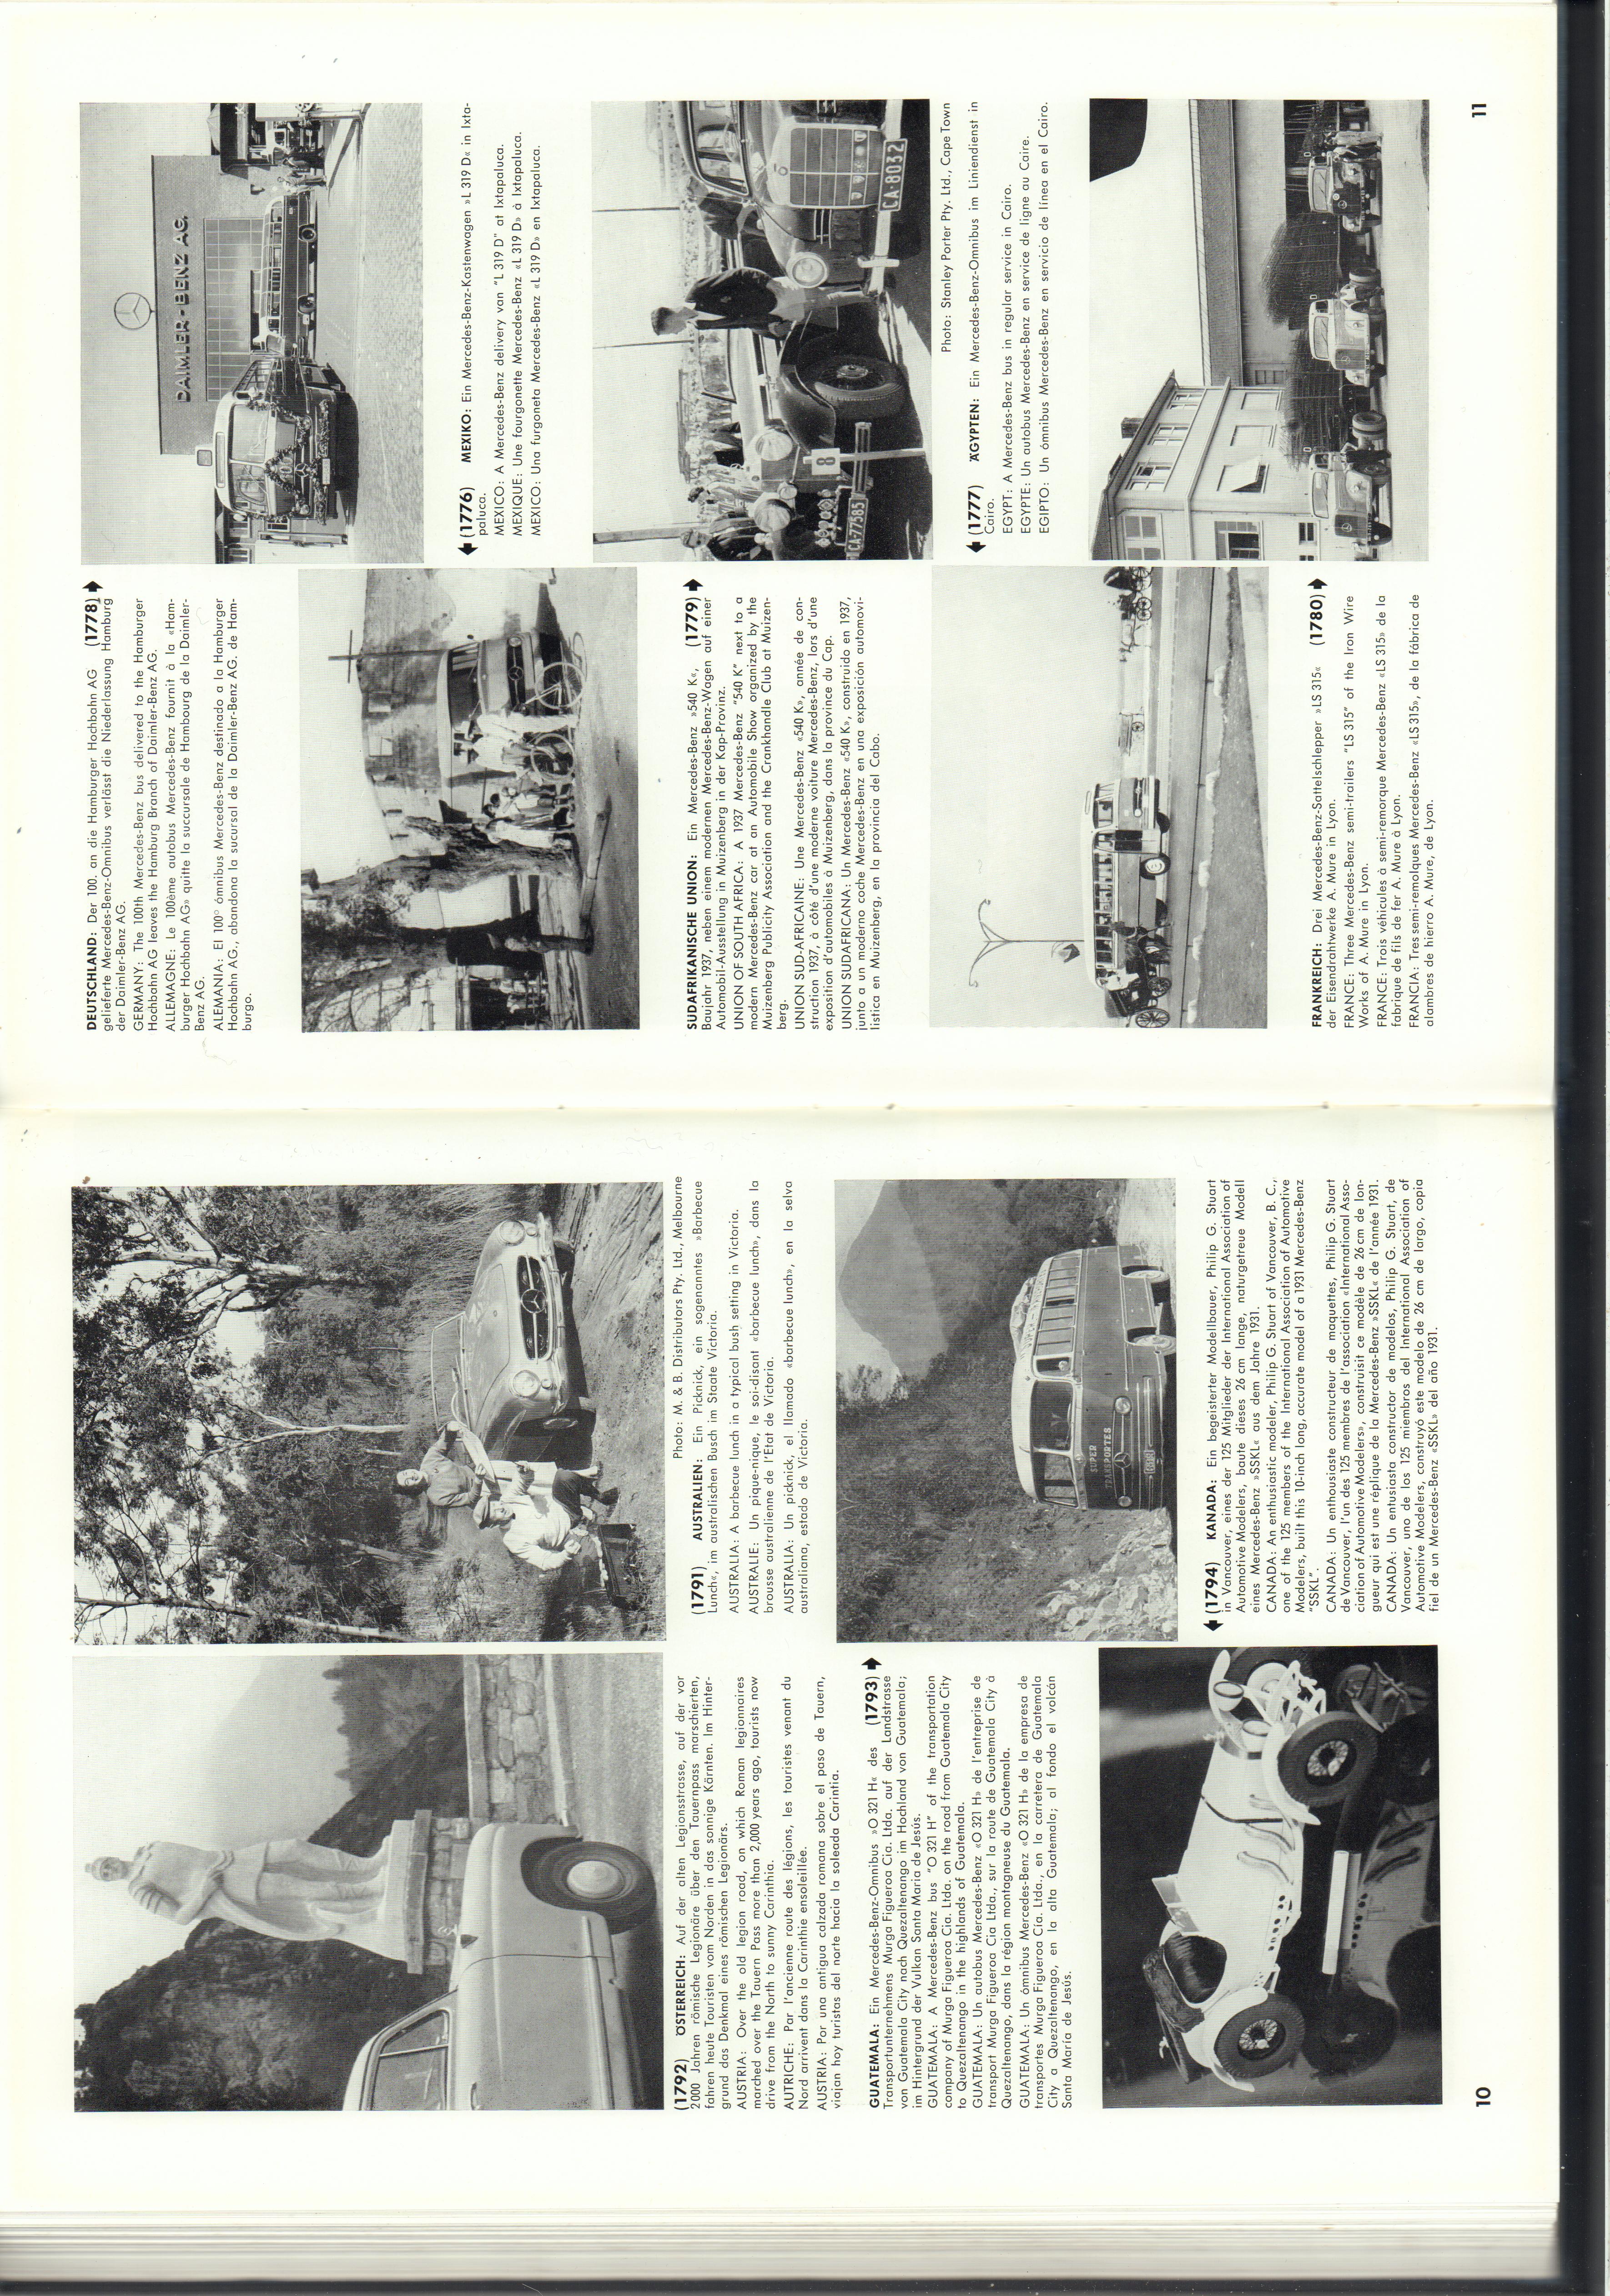 (REVISTA): Periódico In aller welt n.º 14 - Mercedes-Benz no mundo - 1957 - multilingue 006